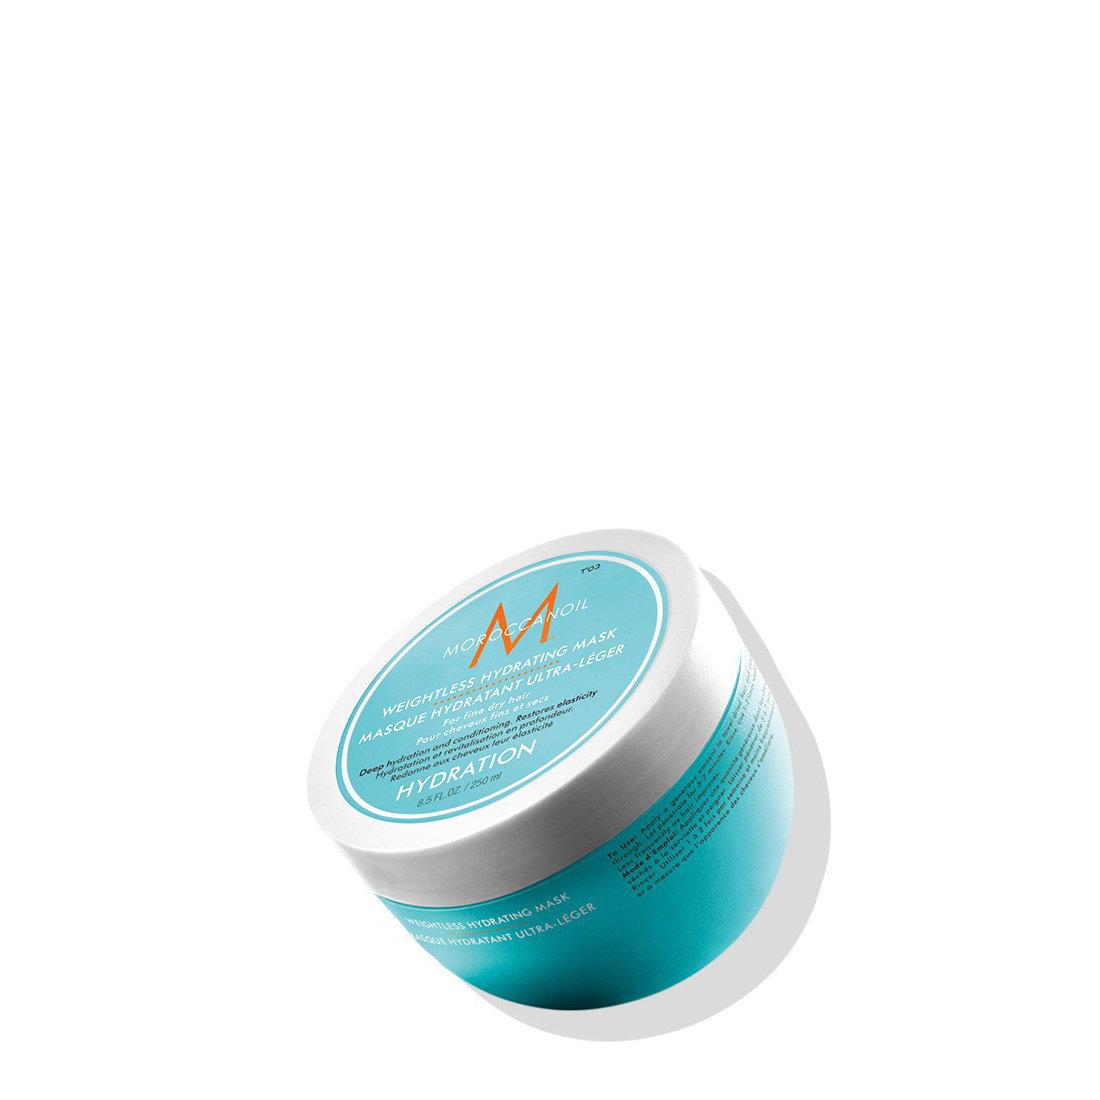 Moroccanoil Weighless Hydrating Mask 250 ml | Mascarilla Hidratante Ultraligera